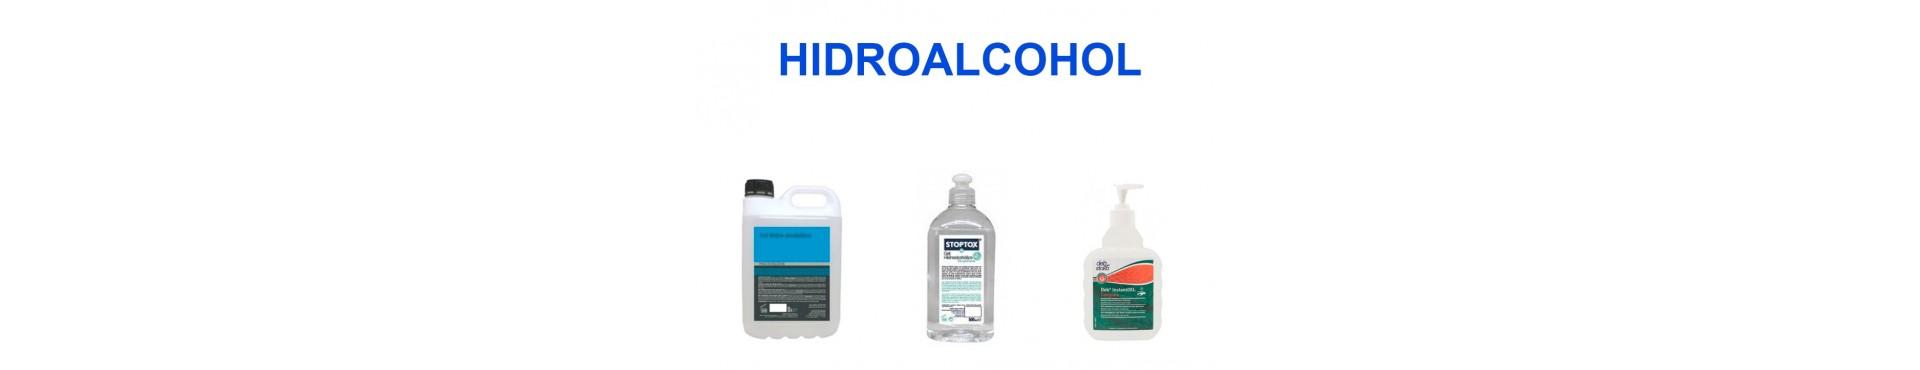 HIDROALCOHOL